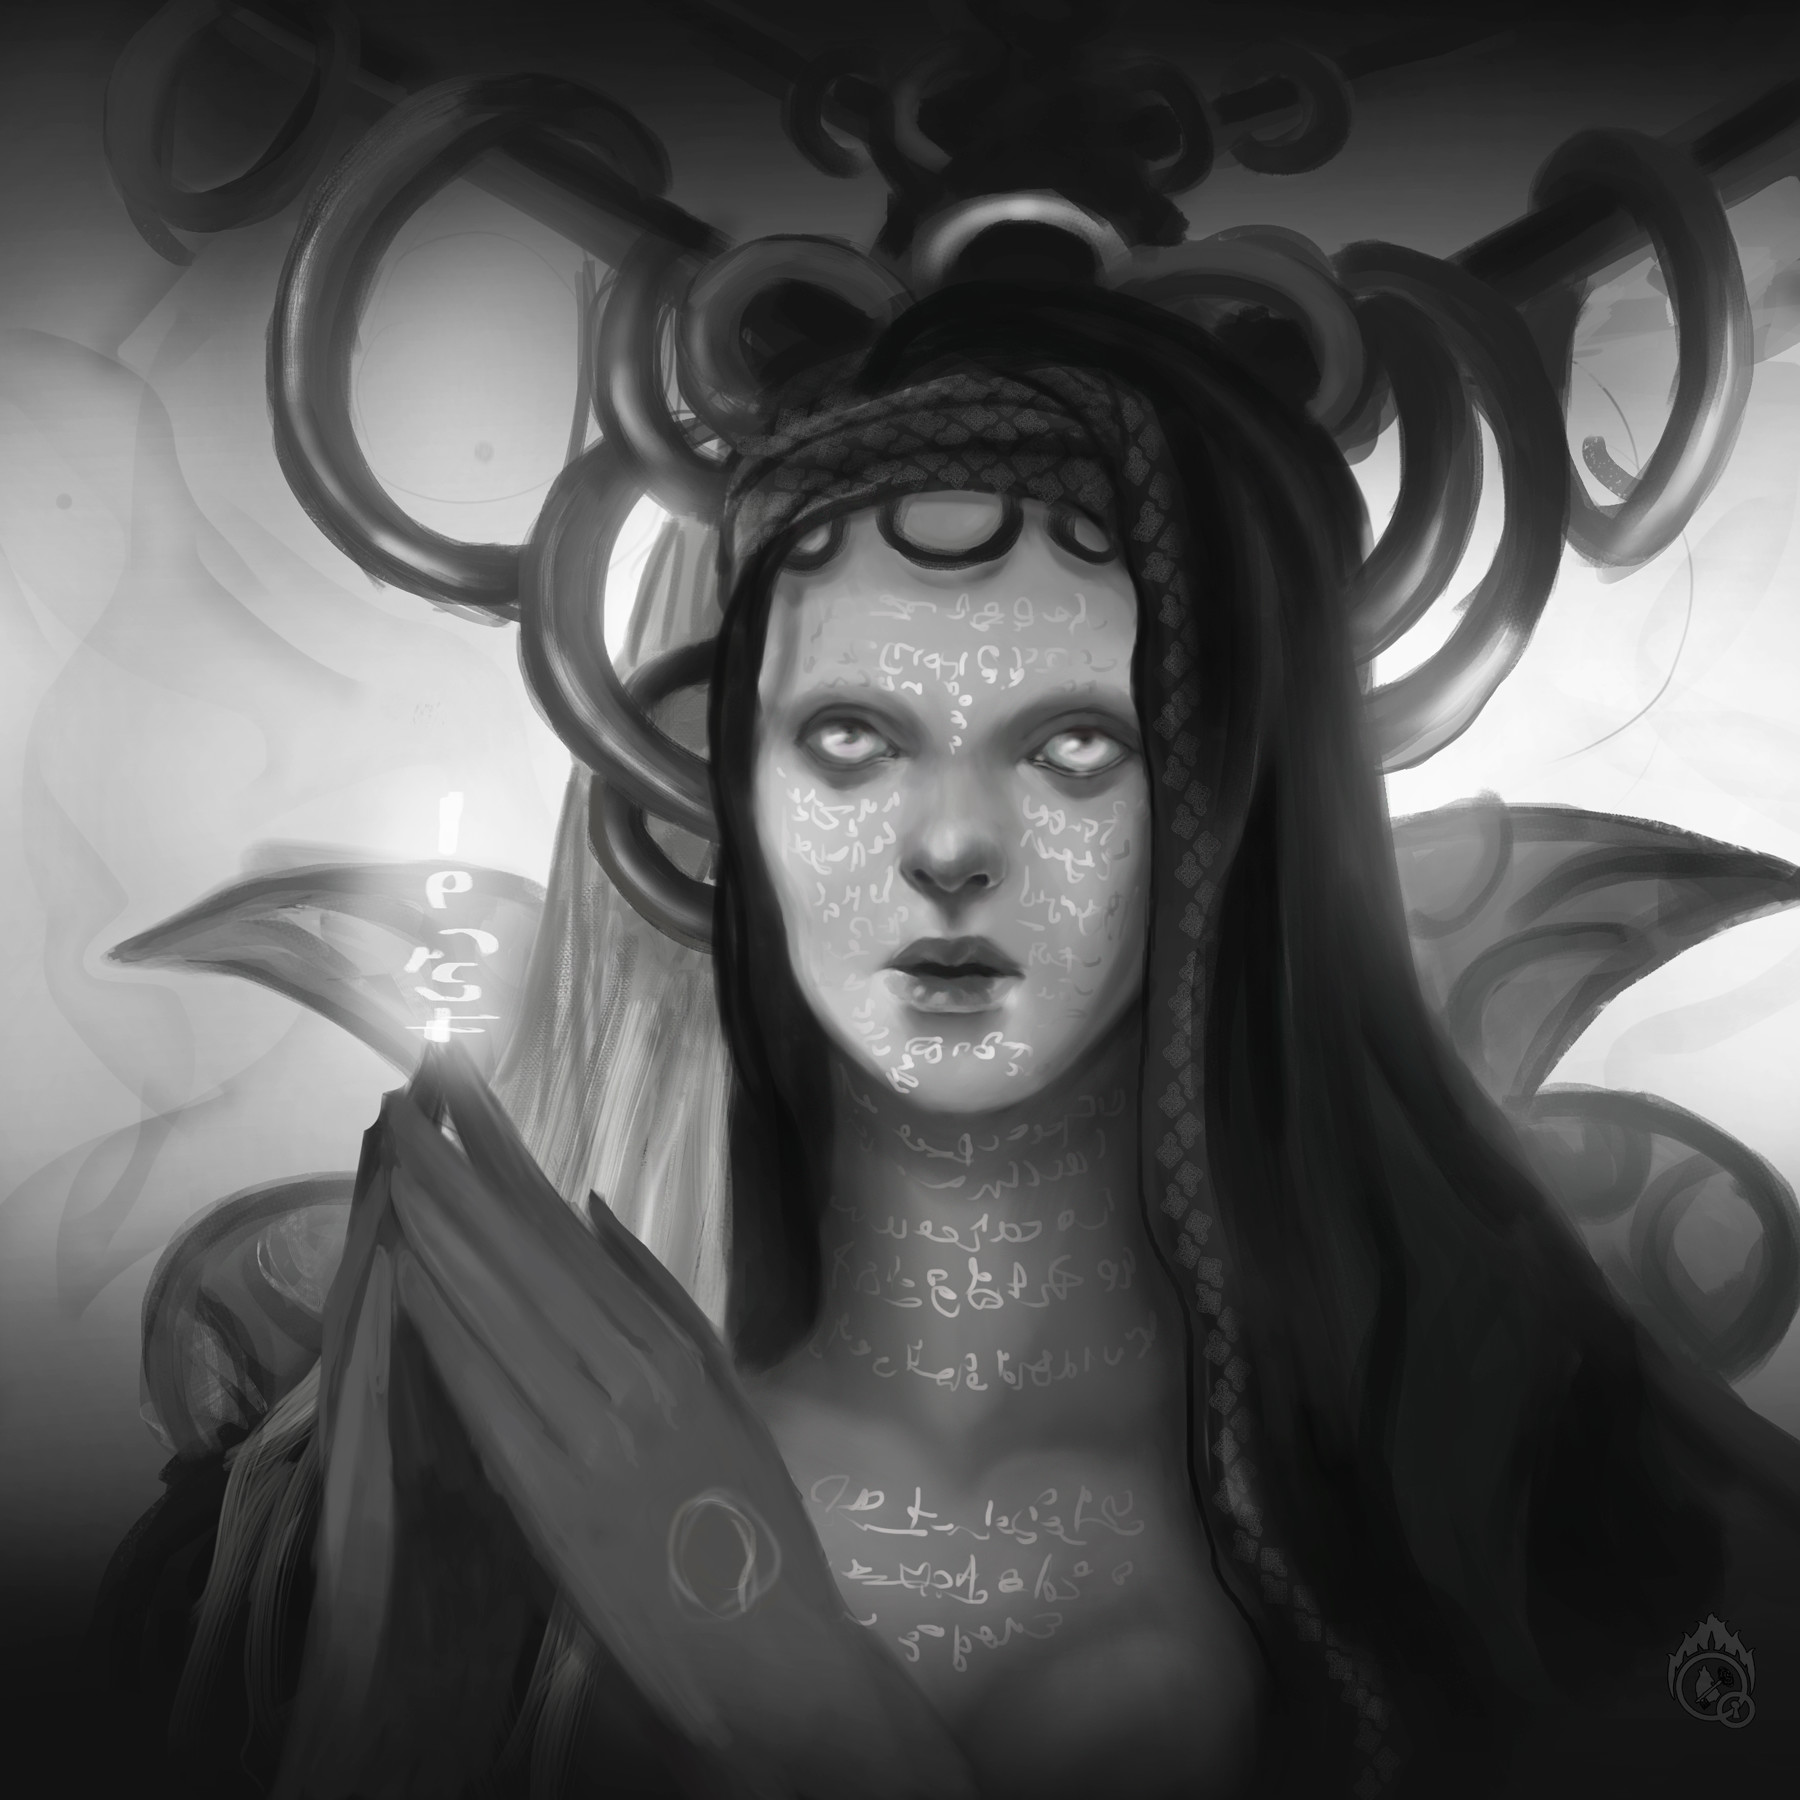 Lorenn tyr sacerdotist trance